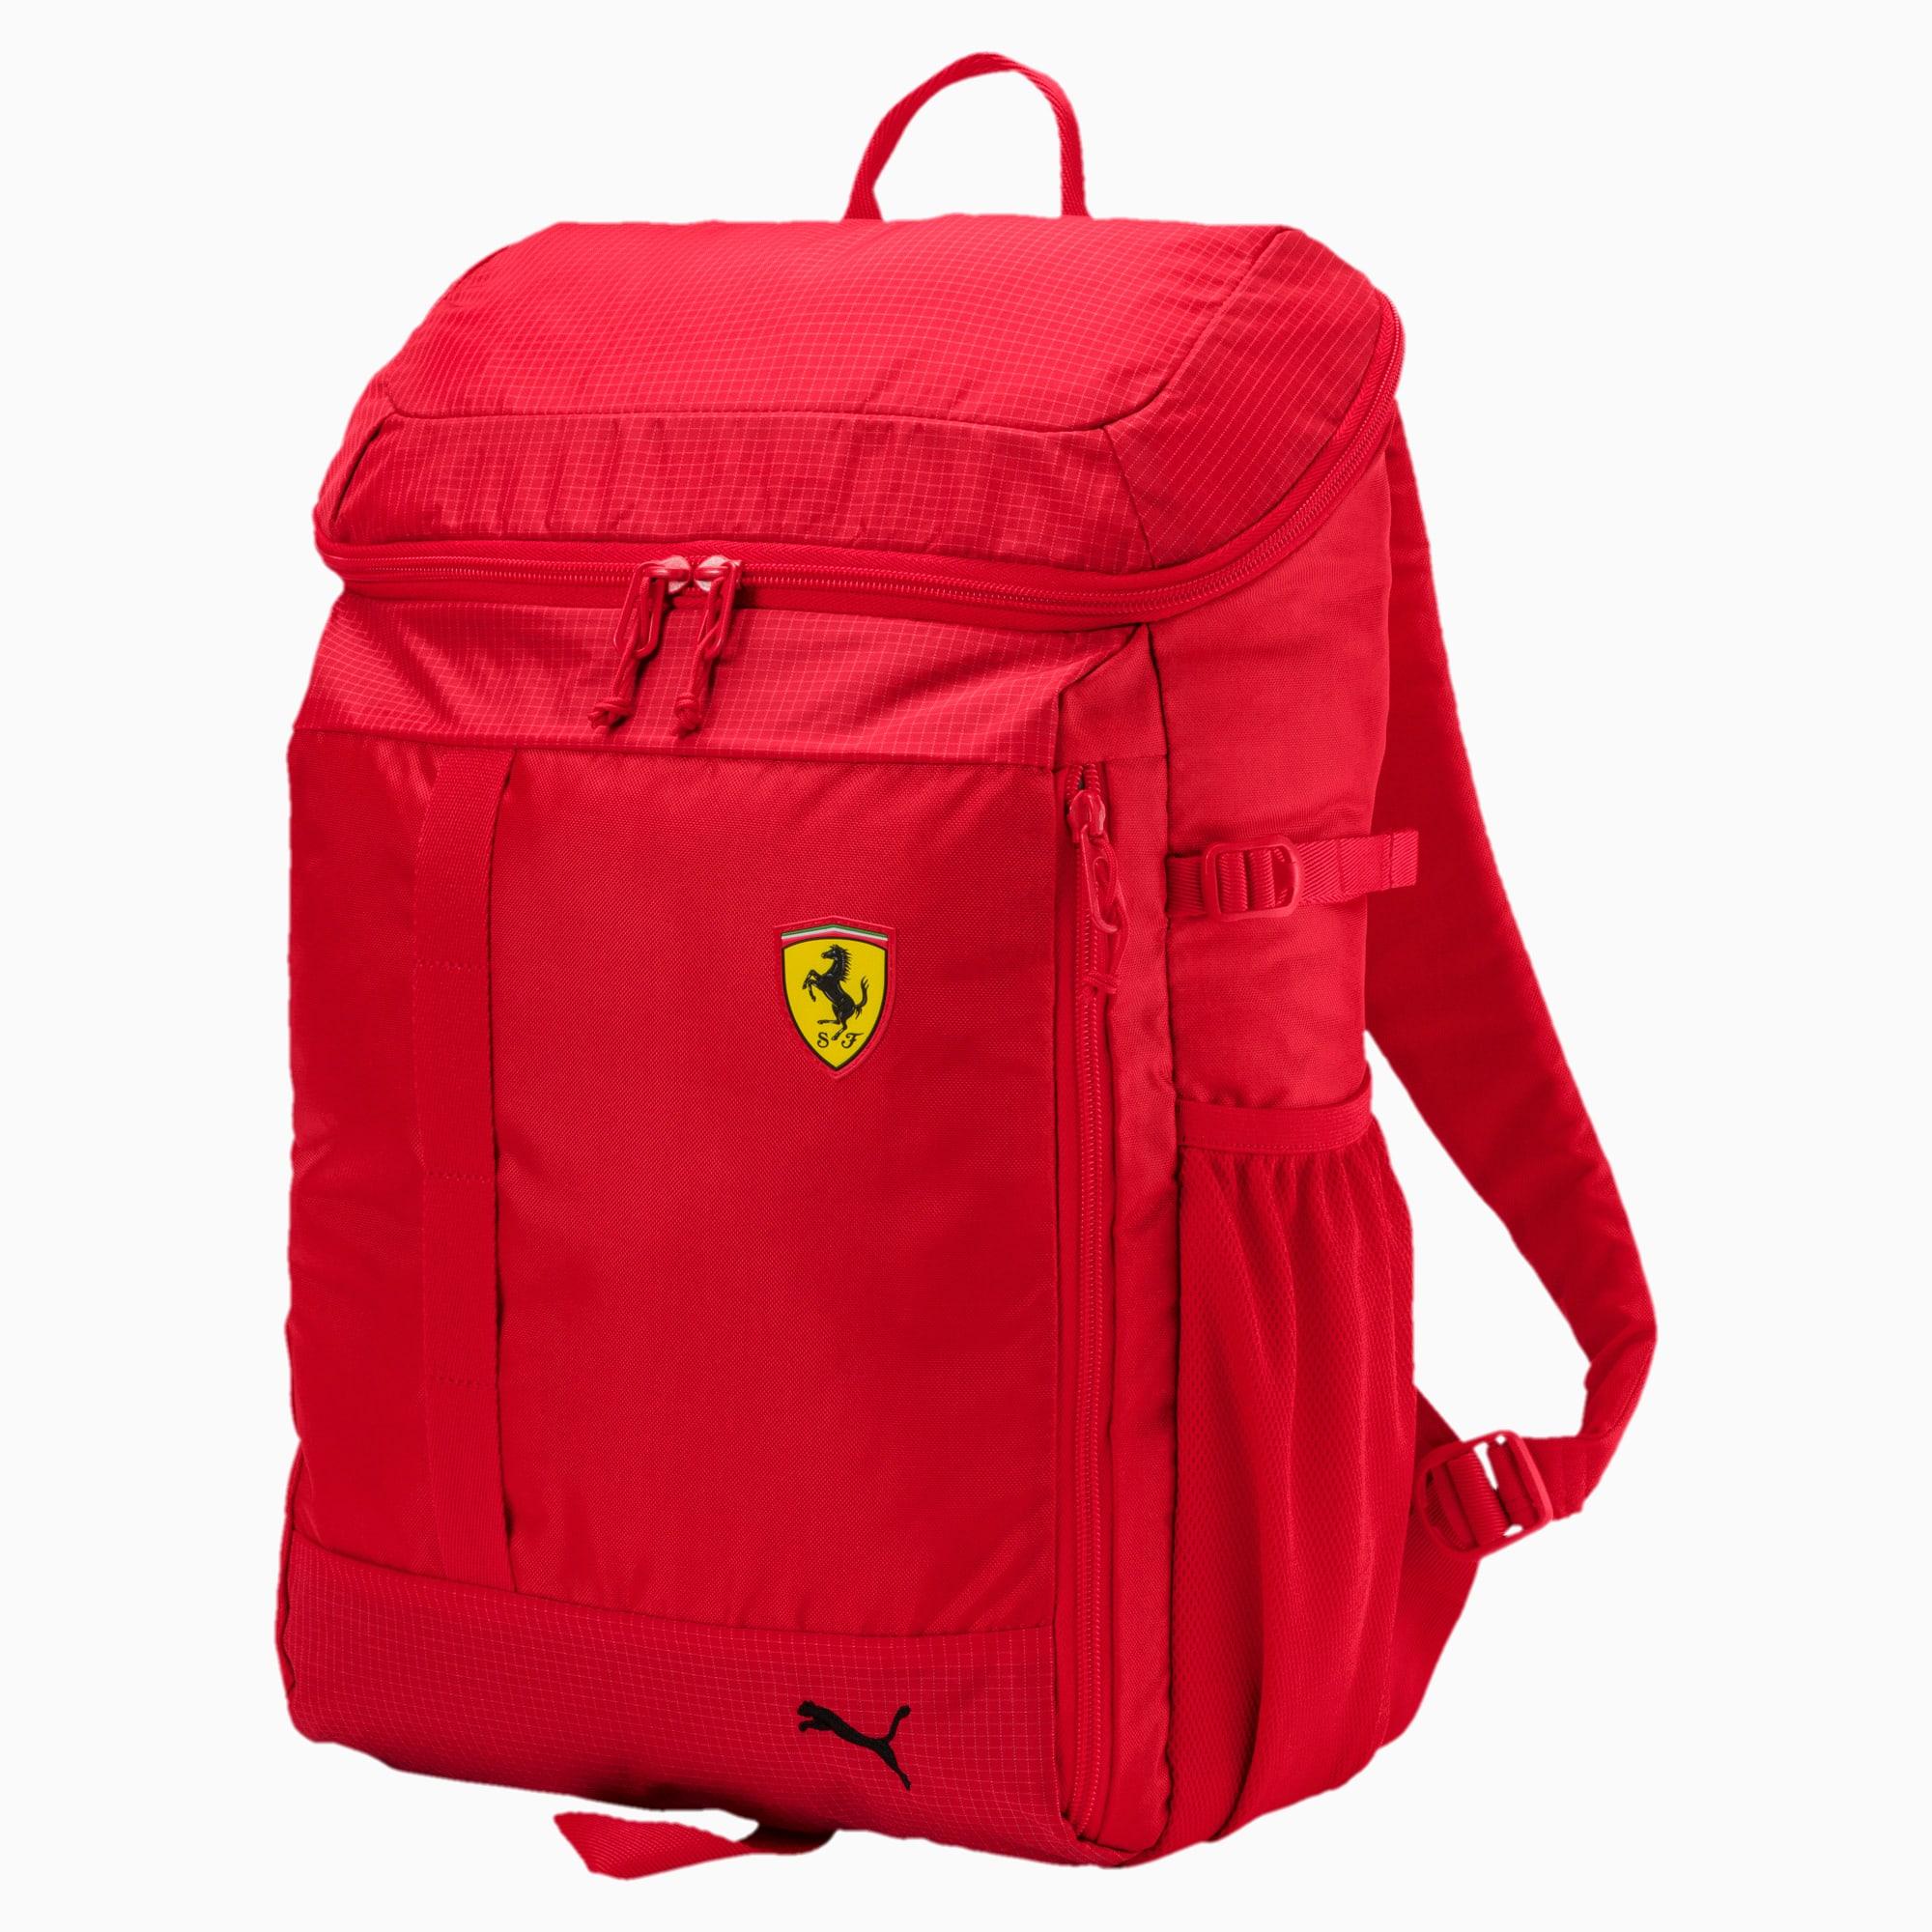 Ferrari Fanwear Backpack Puma New Arrivals Puma Germany